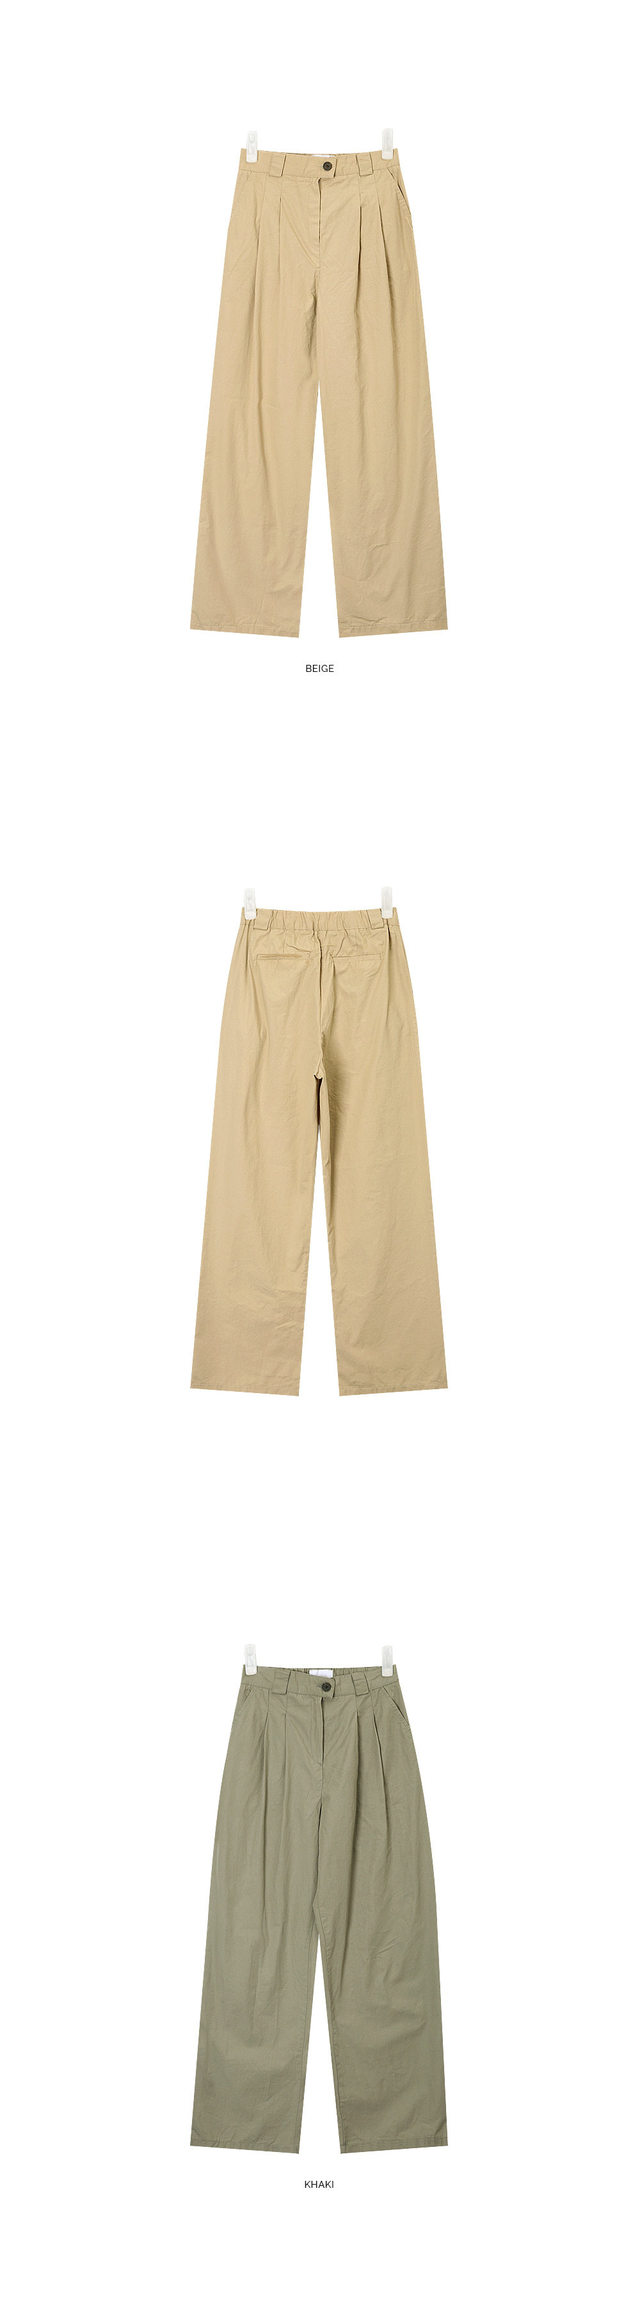 sandy pintuck wide slacks